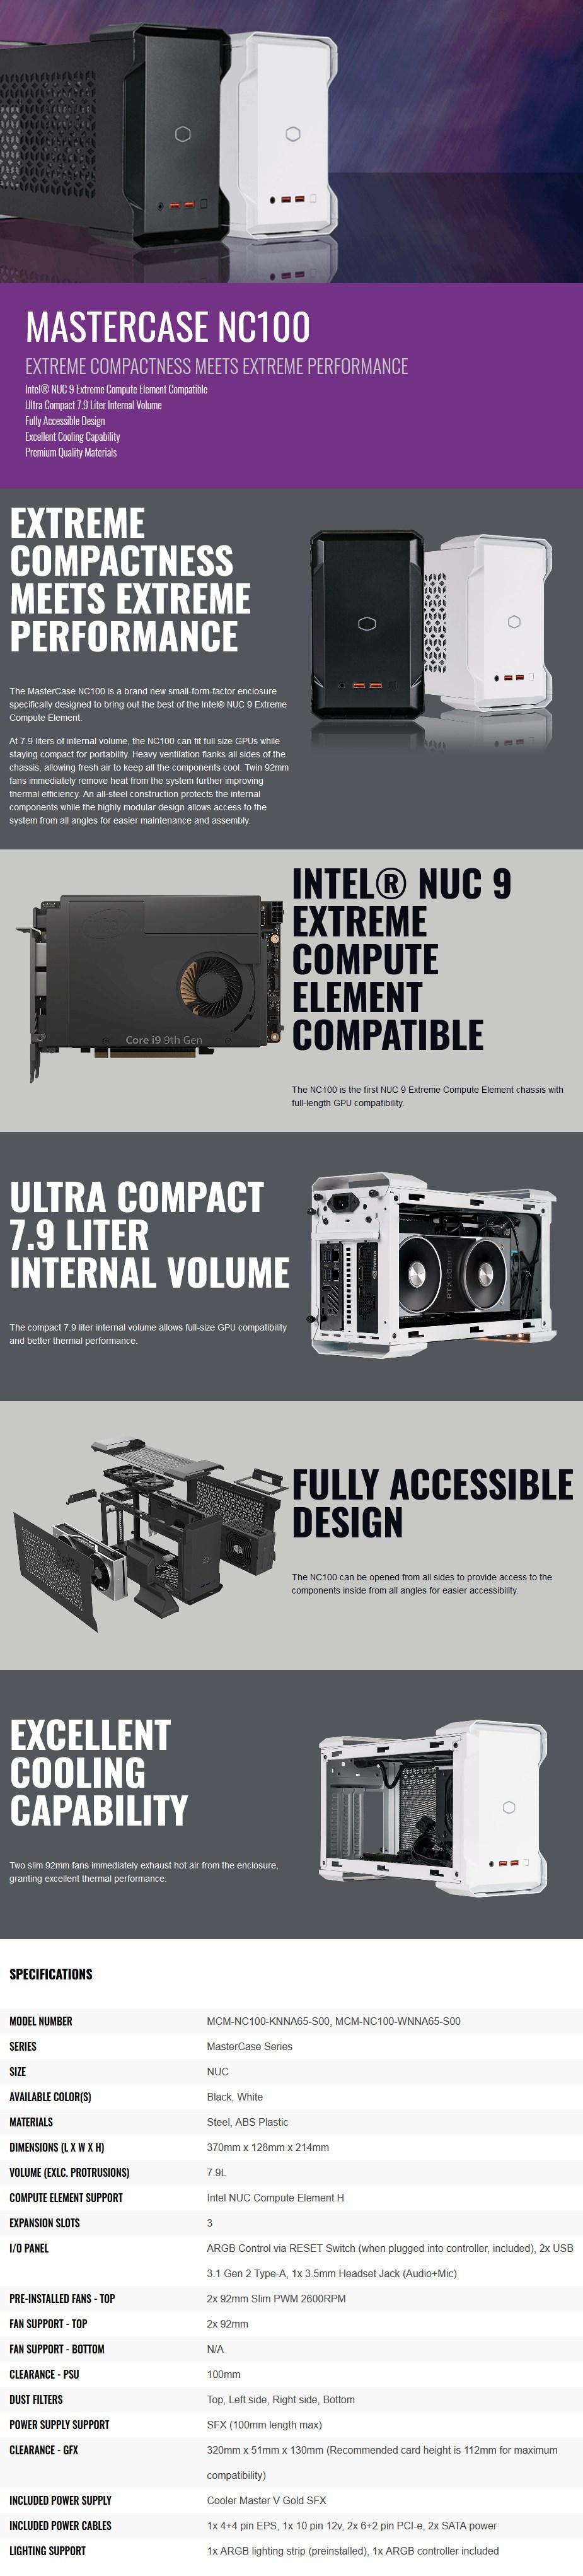 cooler-master-mastercase-nc100-compaact-case-black-ac36476-13.jpg